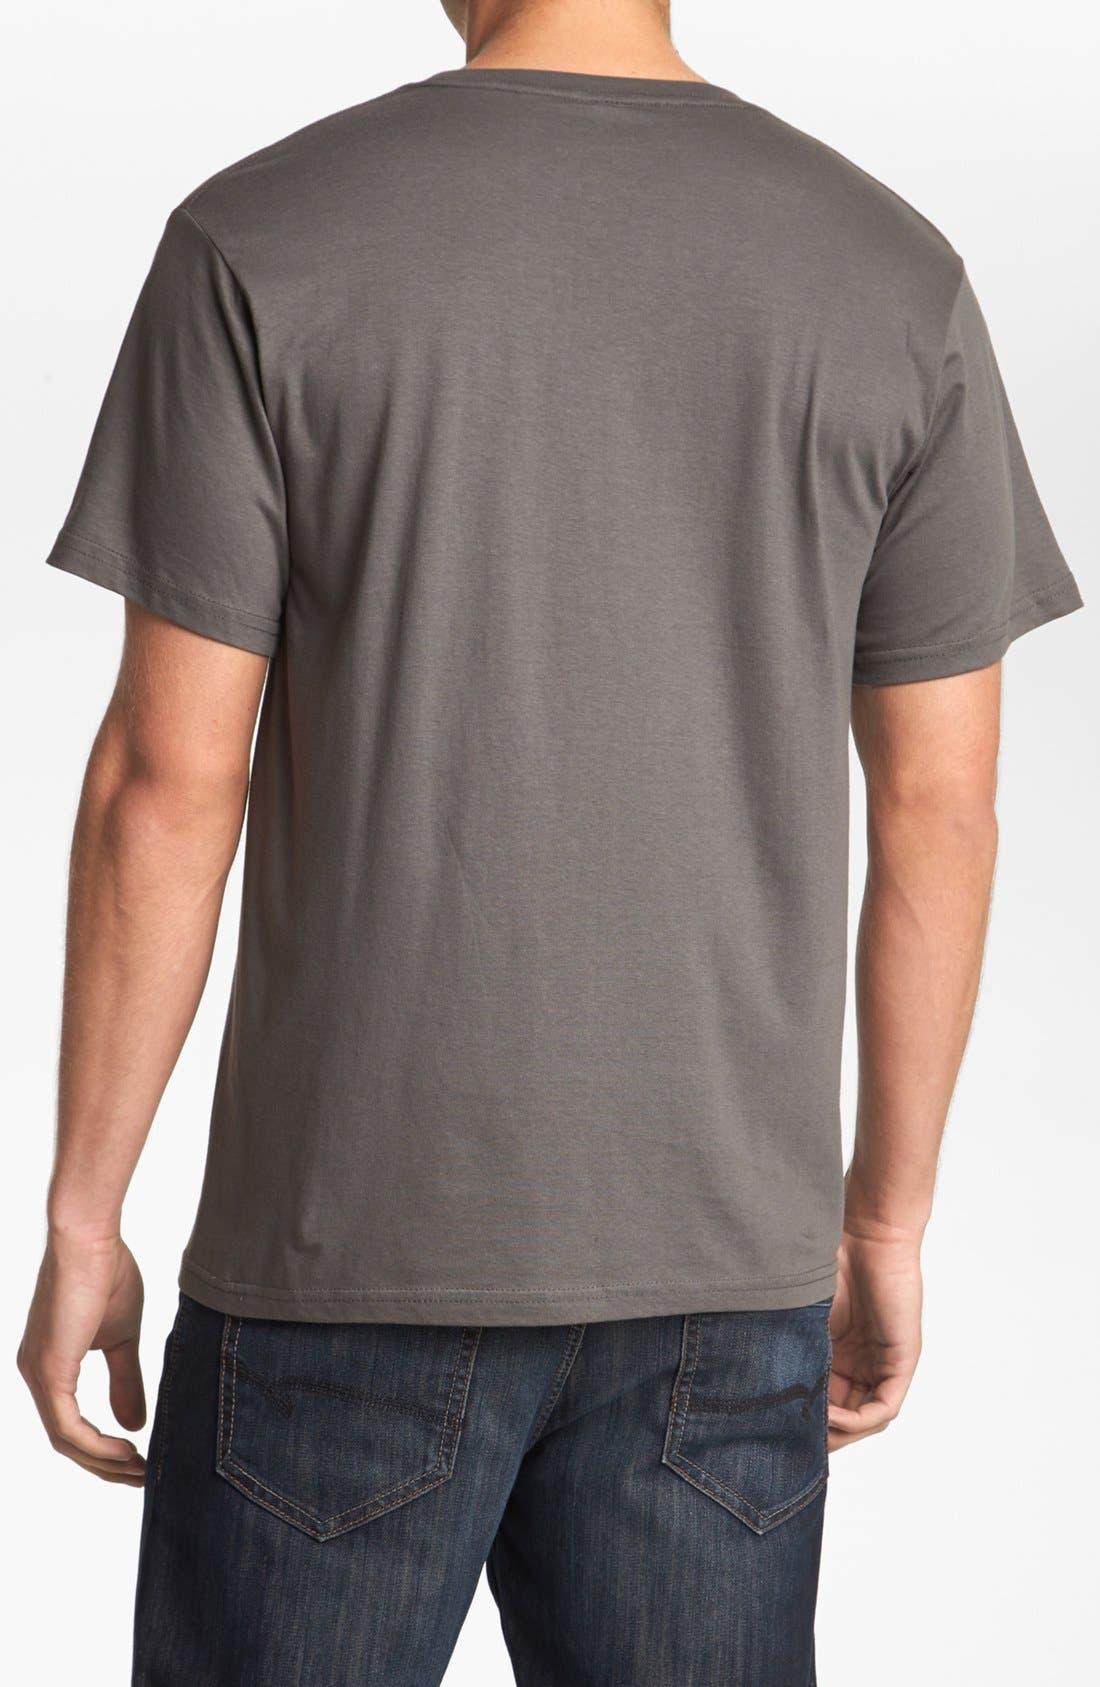 HORSES CUT SHOP,                             'Baranof' T-Shirt,                             Alternate thumbnail 3, color,                             020